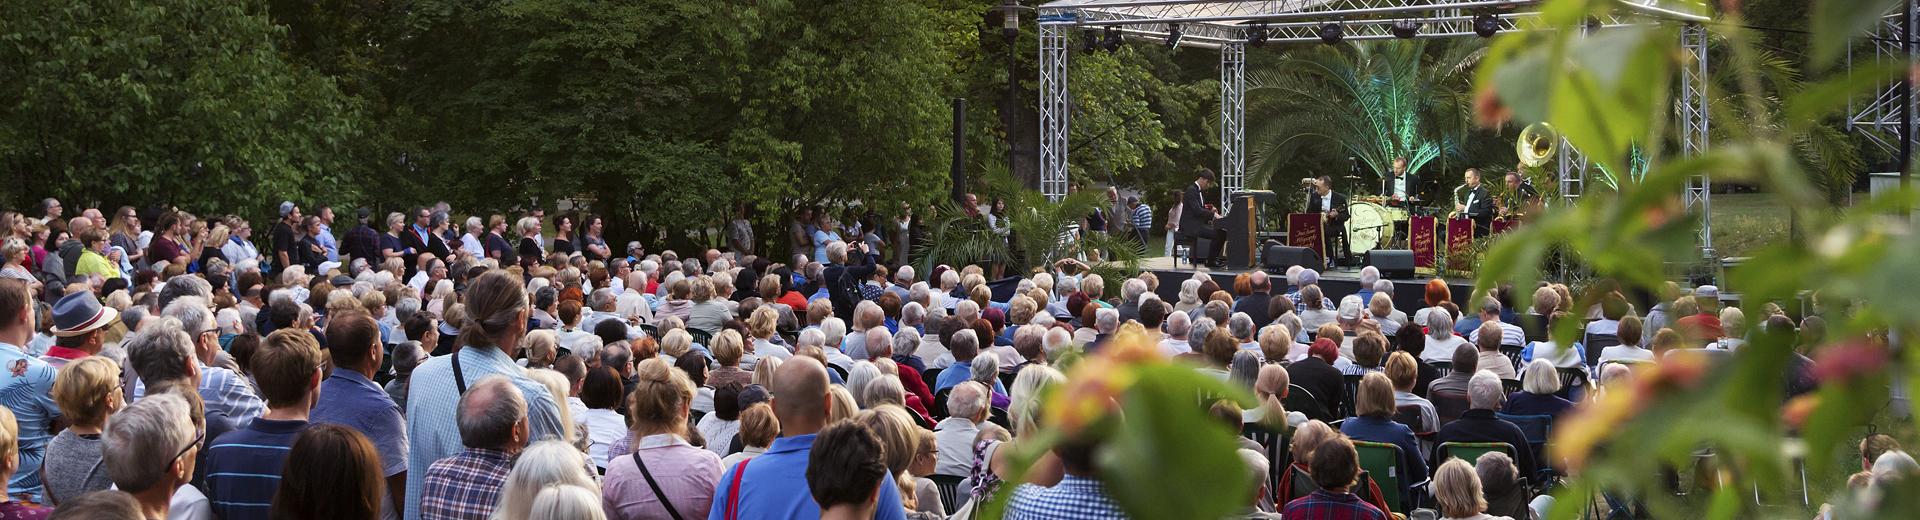 koncert w parku Chopina